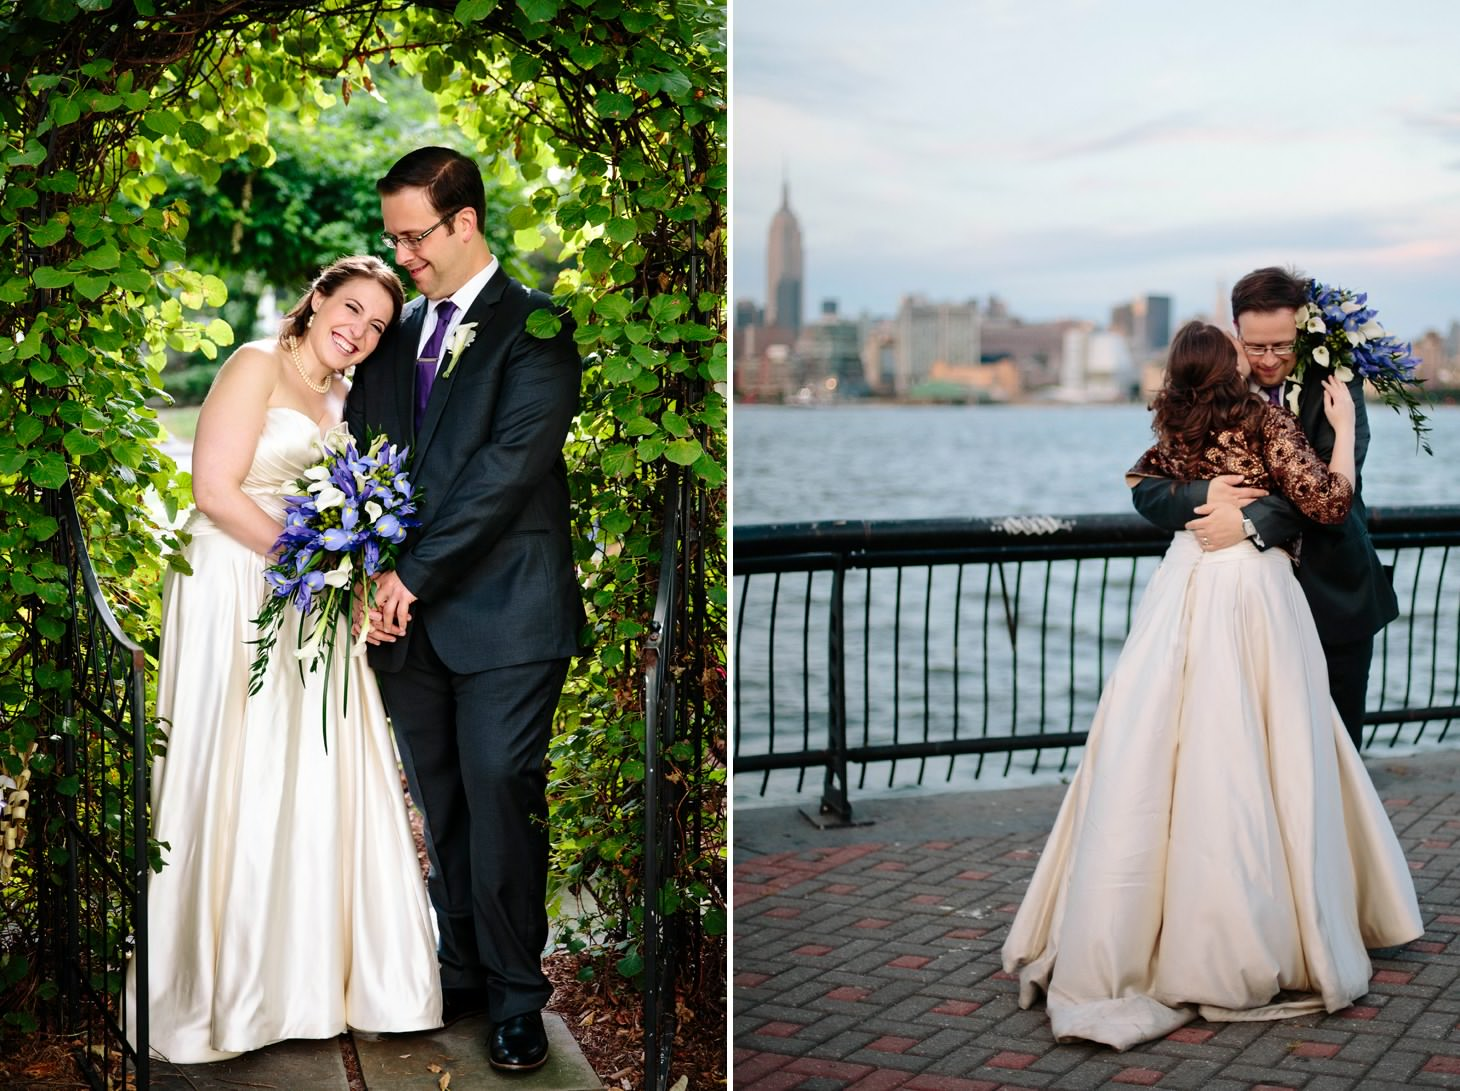 031-nyc-wedding-photographer-smitten-chickens-elope-nyc-wedding-photographer-museum-wedding-smitten-chickens-hoboken.jpg